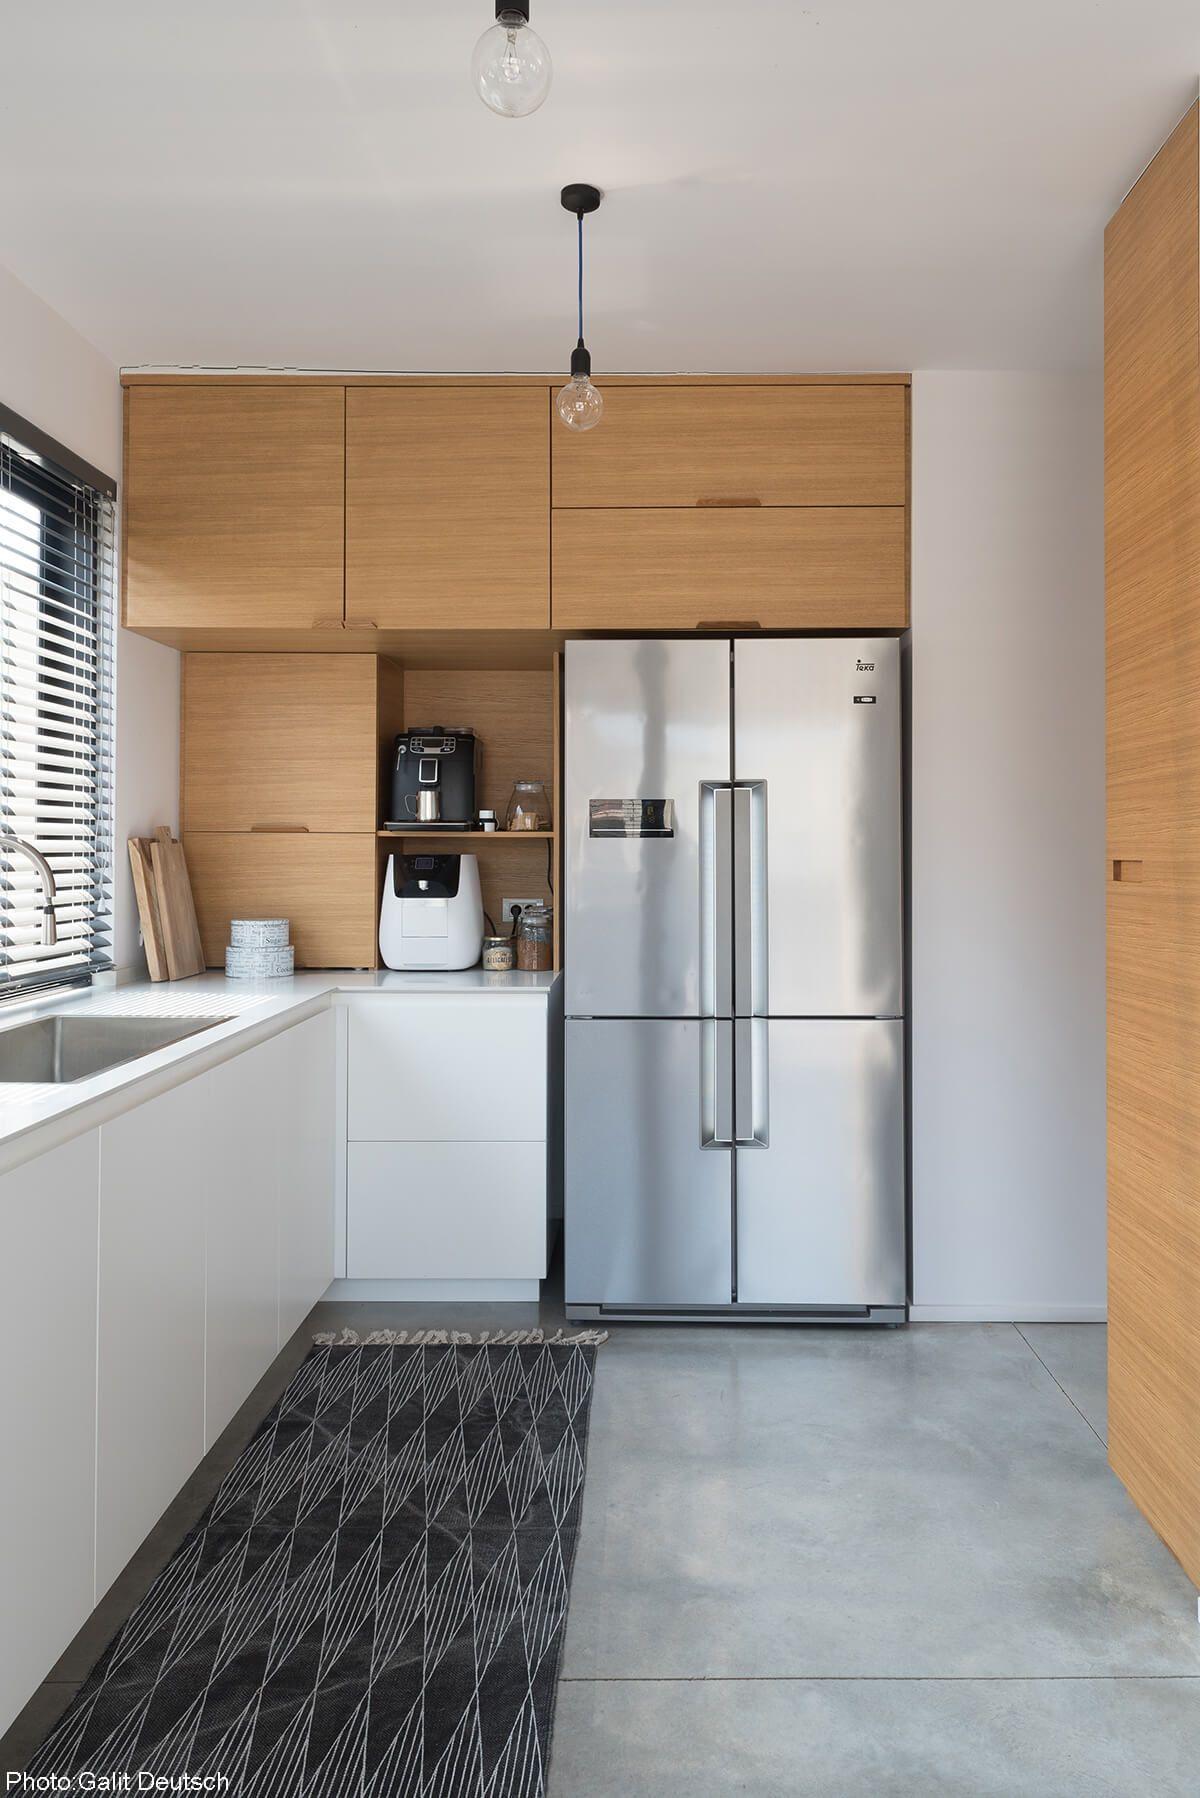 90sqm Duplex Apartment Fineshmaker Kitchen Room Design Minimal Kitchen Design Kitchen Design Small